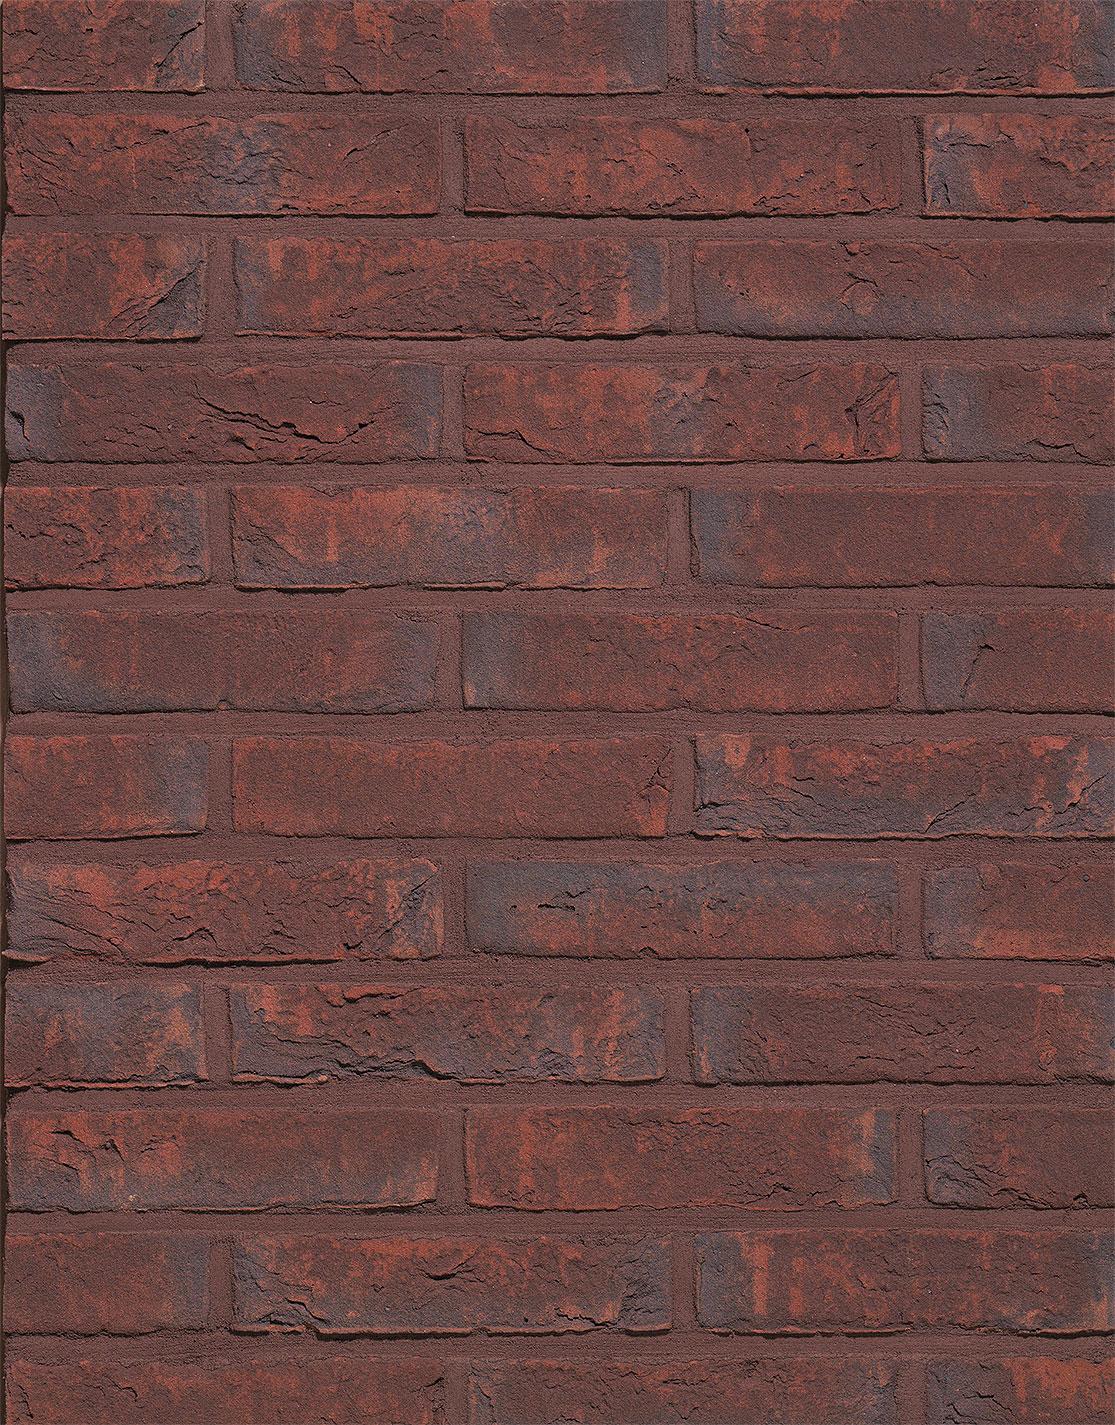 dital-soluciones-wienerberger-brick-coleccion-agora-wijnrood-blue-velvet